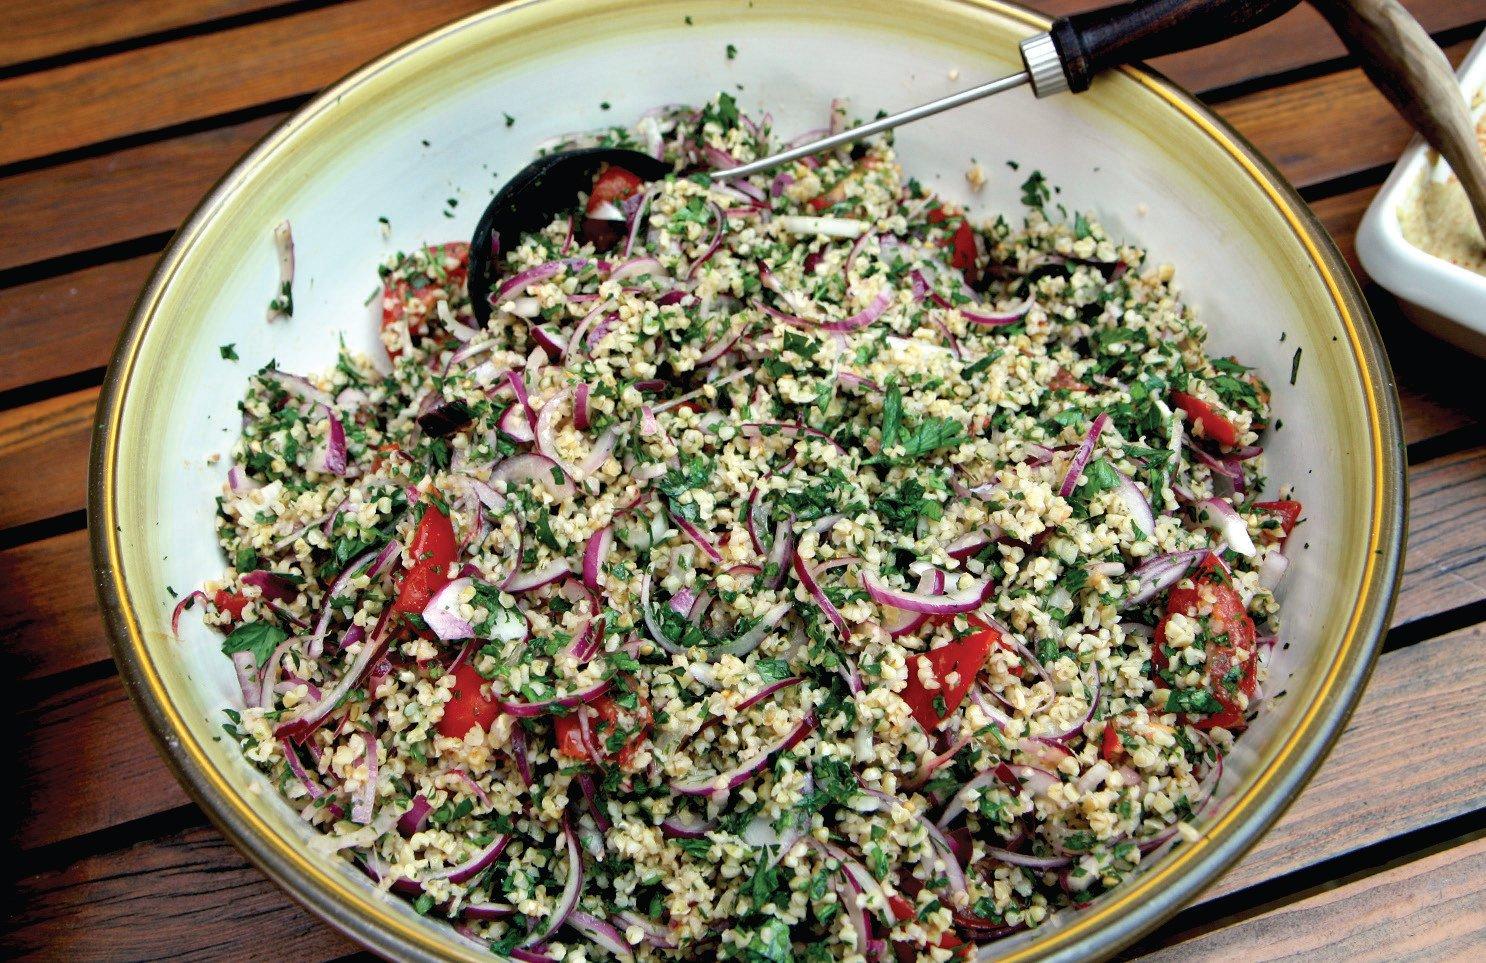 le spezie nella cucina vegetariana e vegana - Ricette Di Cucina Gratis